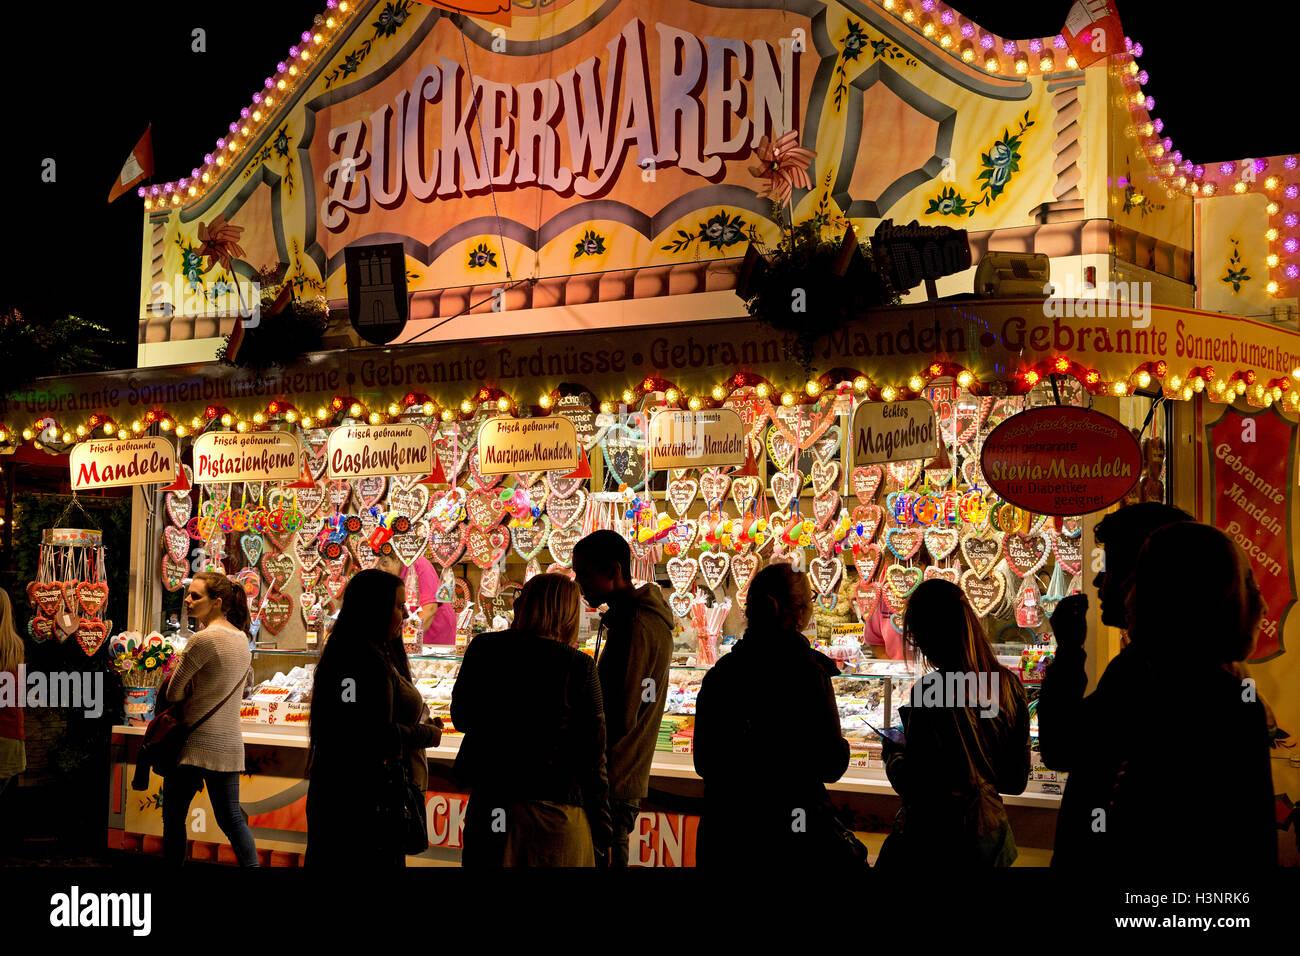 sweets stall, Dom, Hamburg, Germany - Stock Image